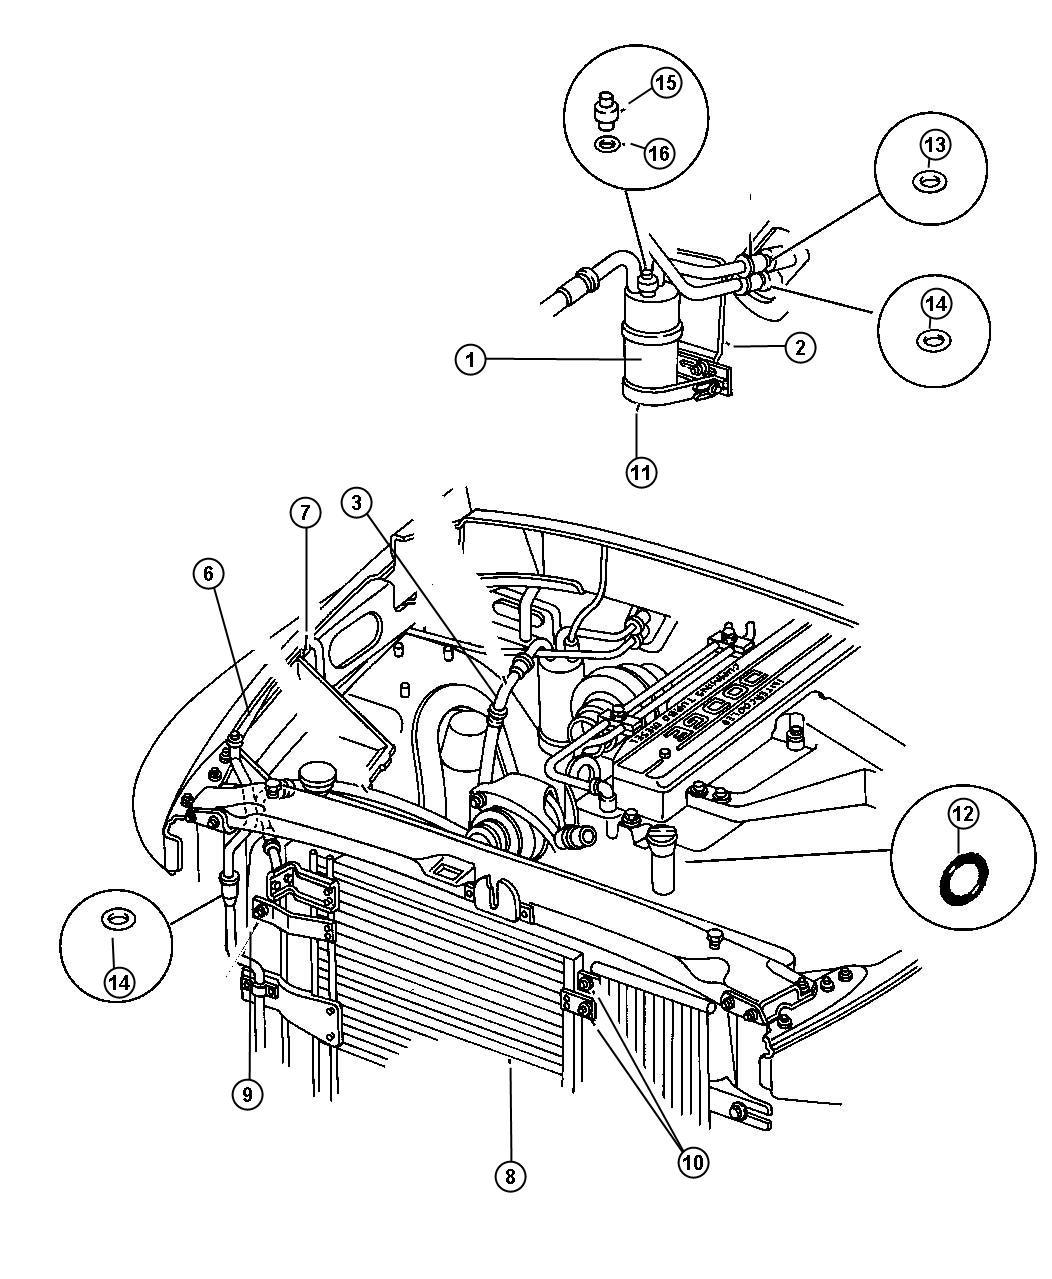 Dodge Ram 1500 Condenser. Air conditioning. Plumbing